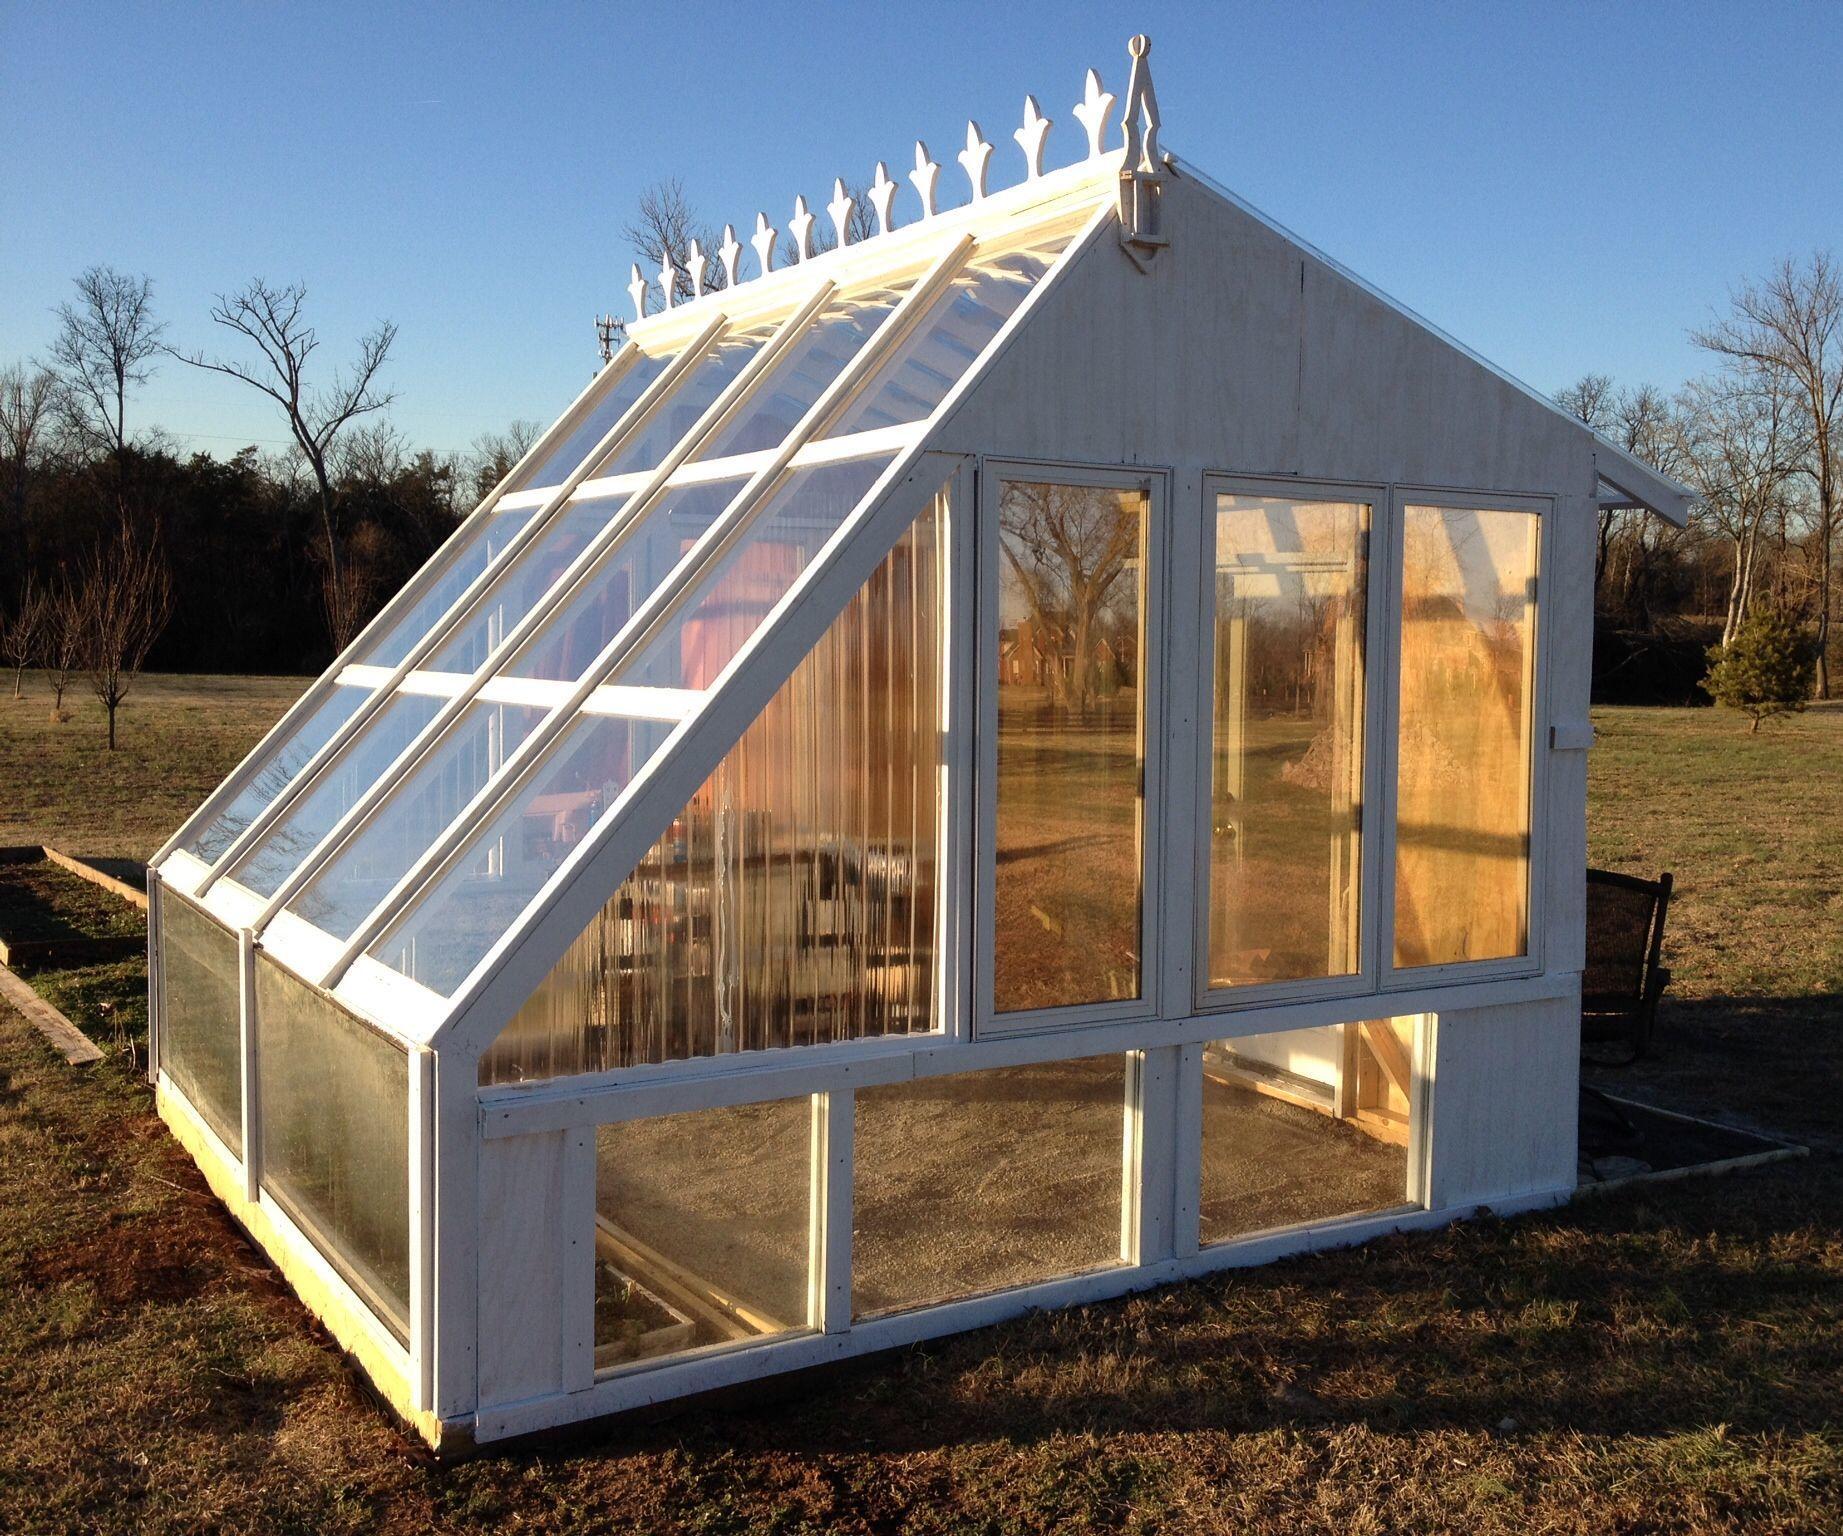 Backyard Greenhouse From Reclaimed Windows Backyard Greenhouse Build A Greenhouse Diy Greenhouse Plans Greenhouse ideas for backyard